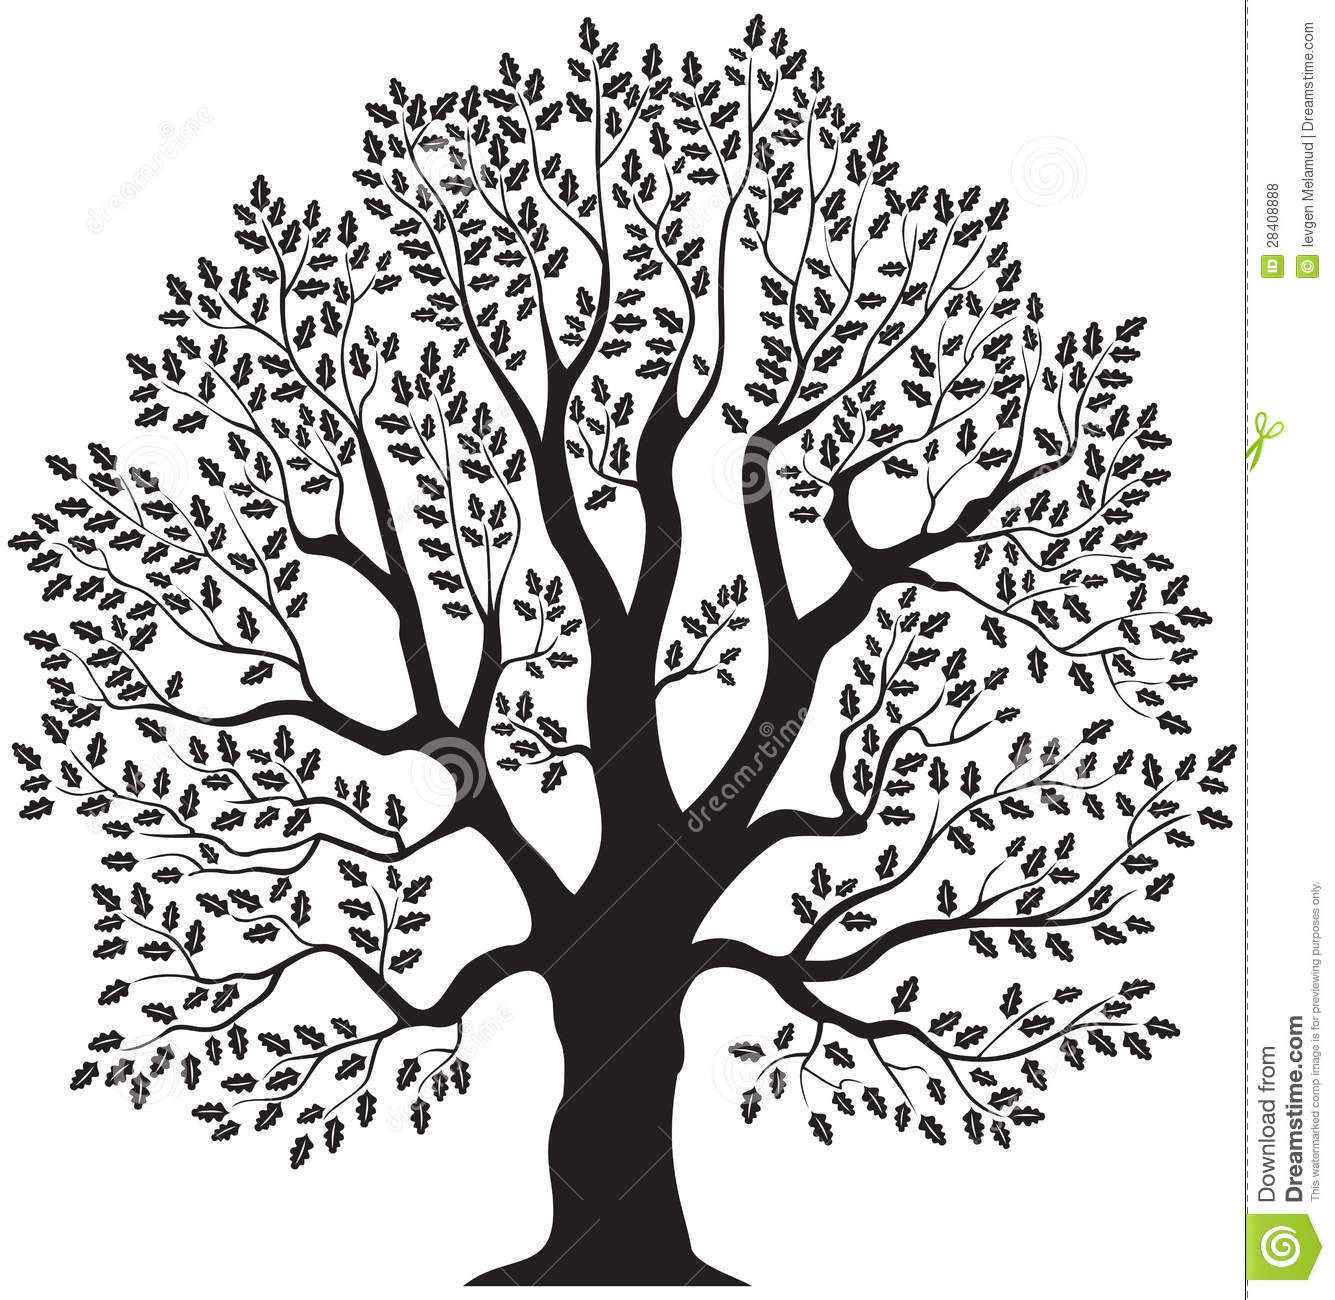 1335x1300 Free Clipart Oak Tree Amp Free Clip Art Oak Tree Images